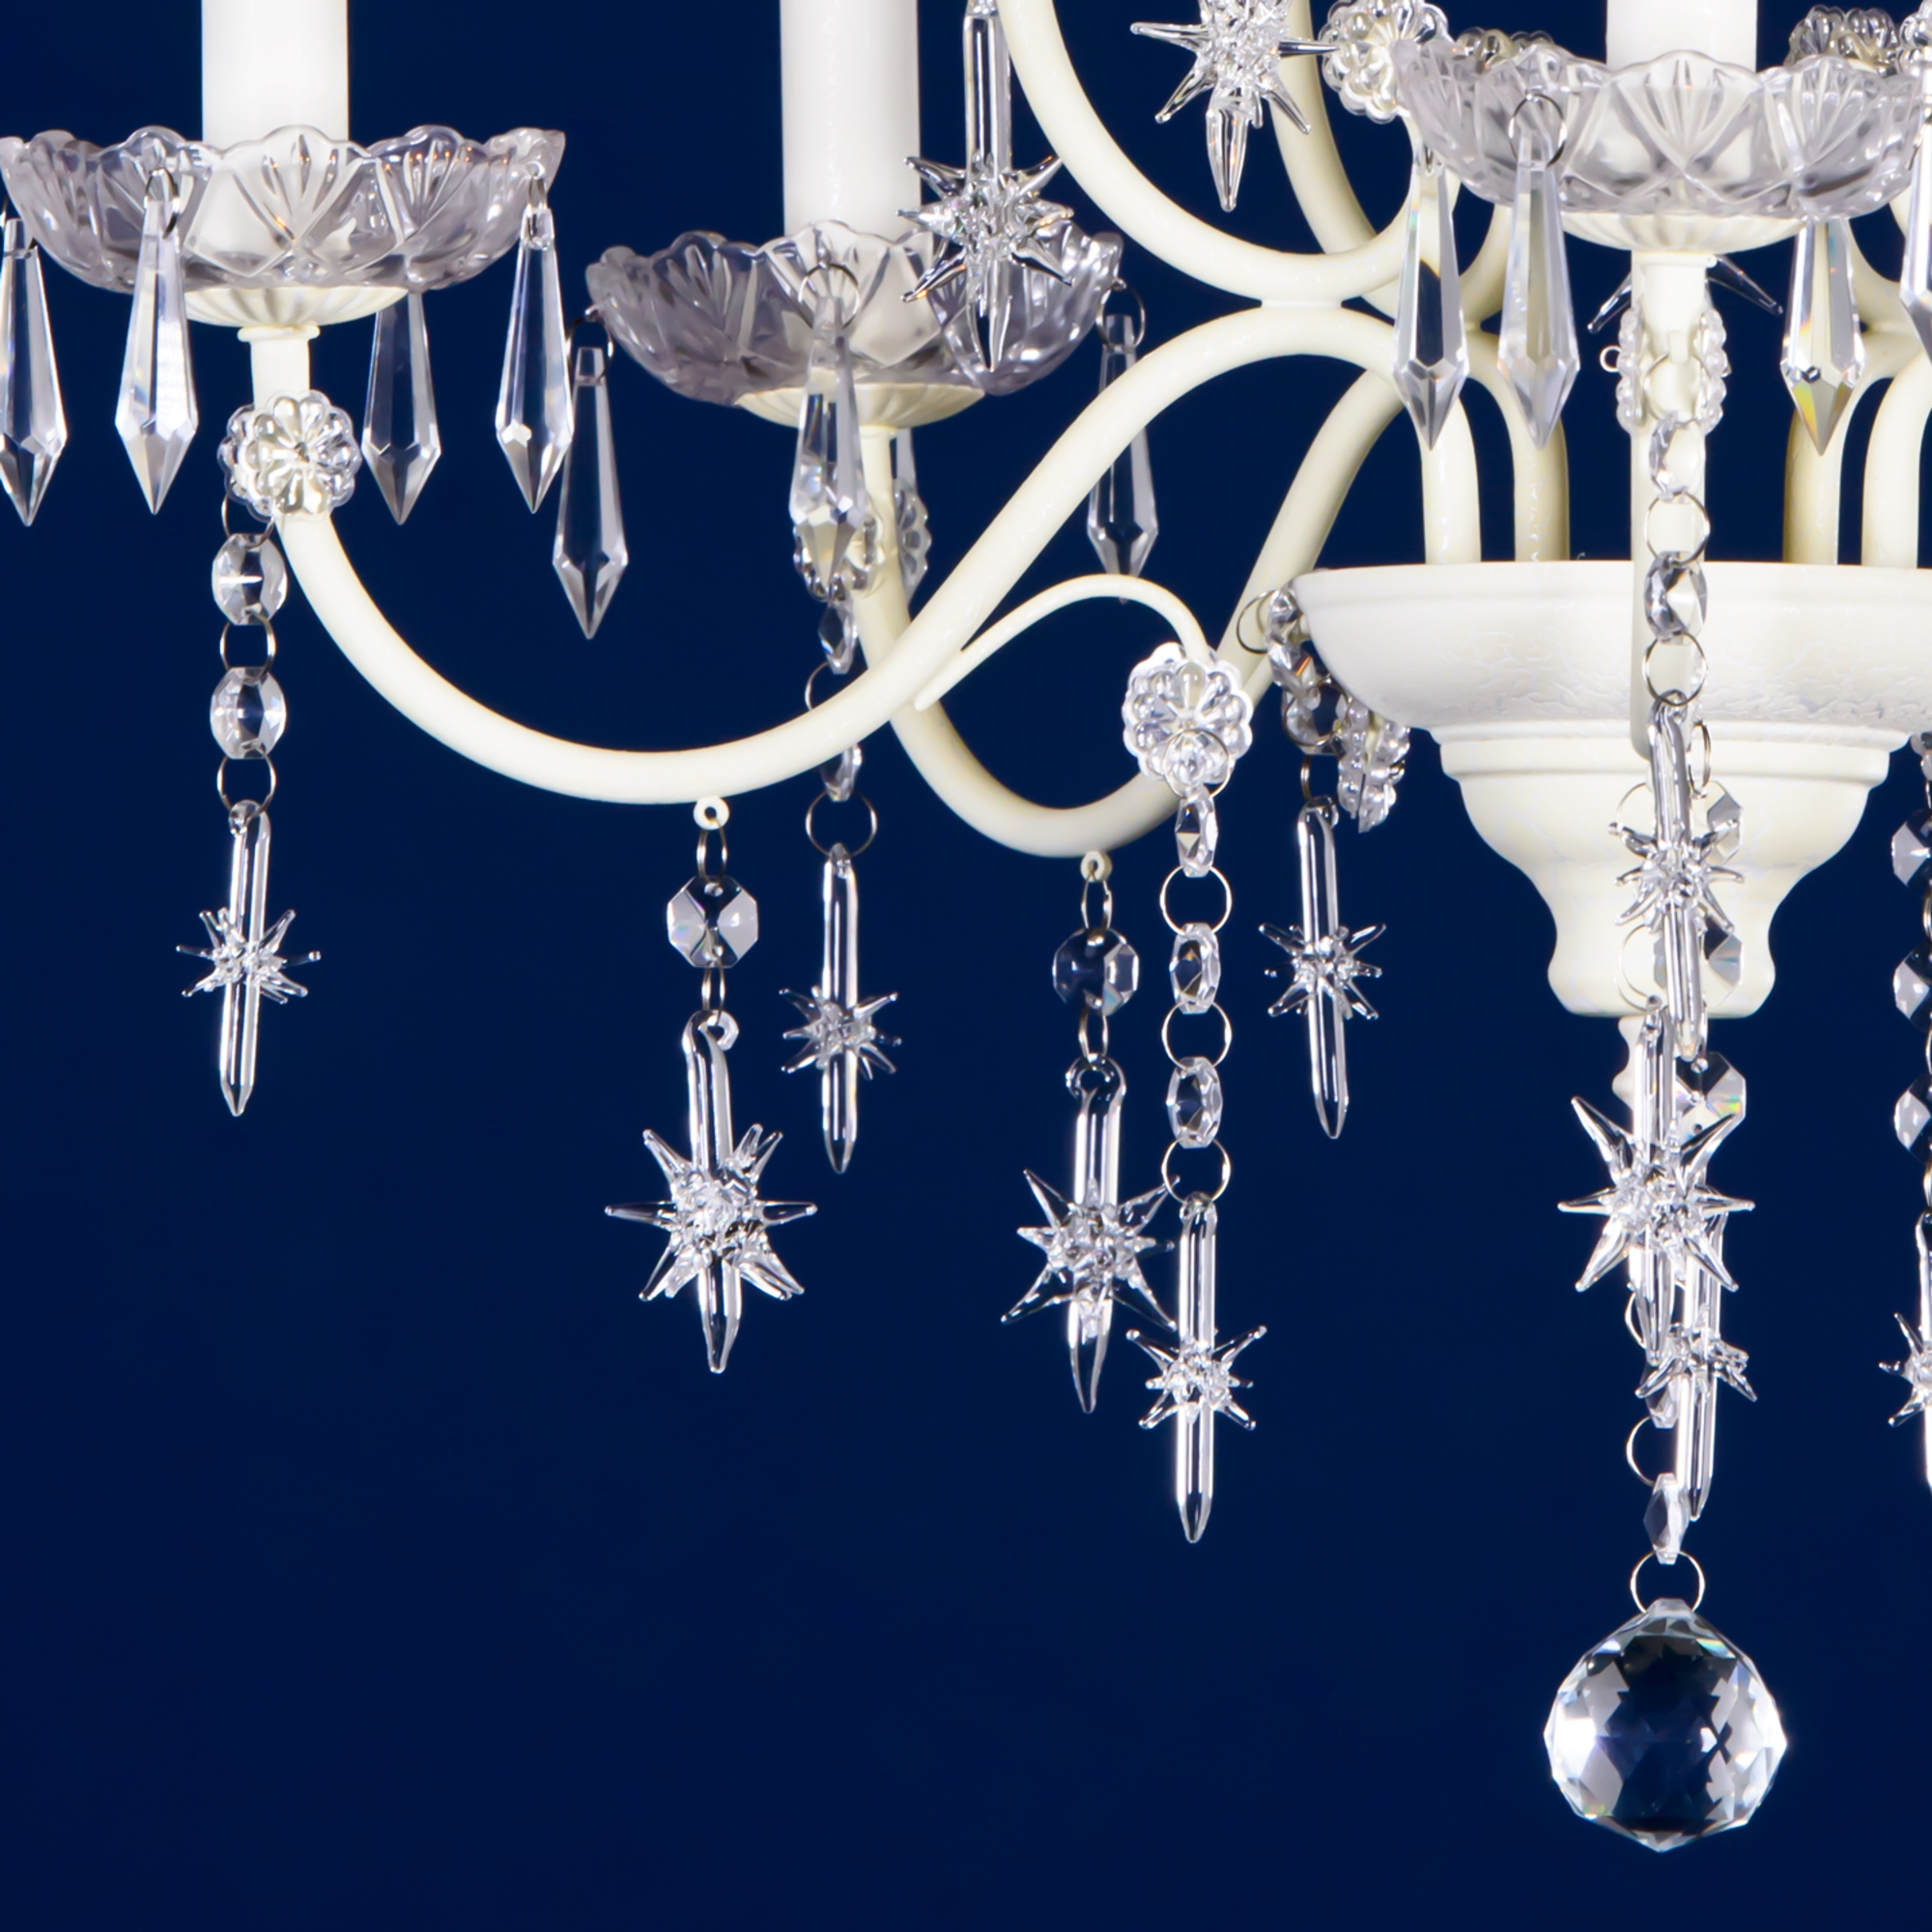 Star-Shaped Drops 5 Light Chandelier - Cream